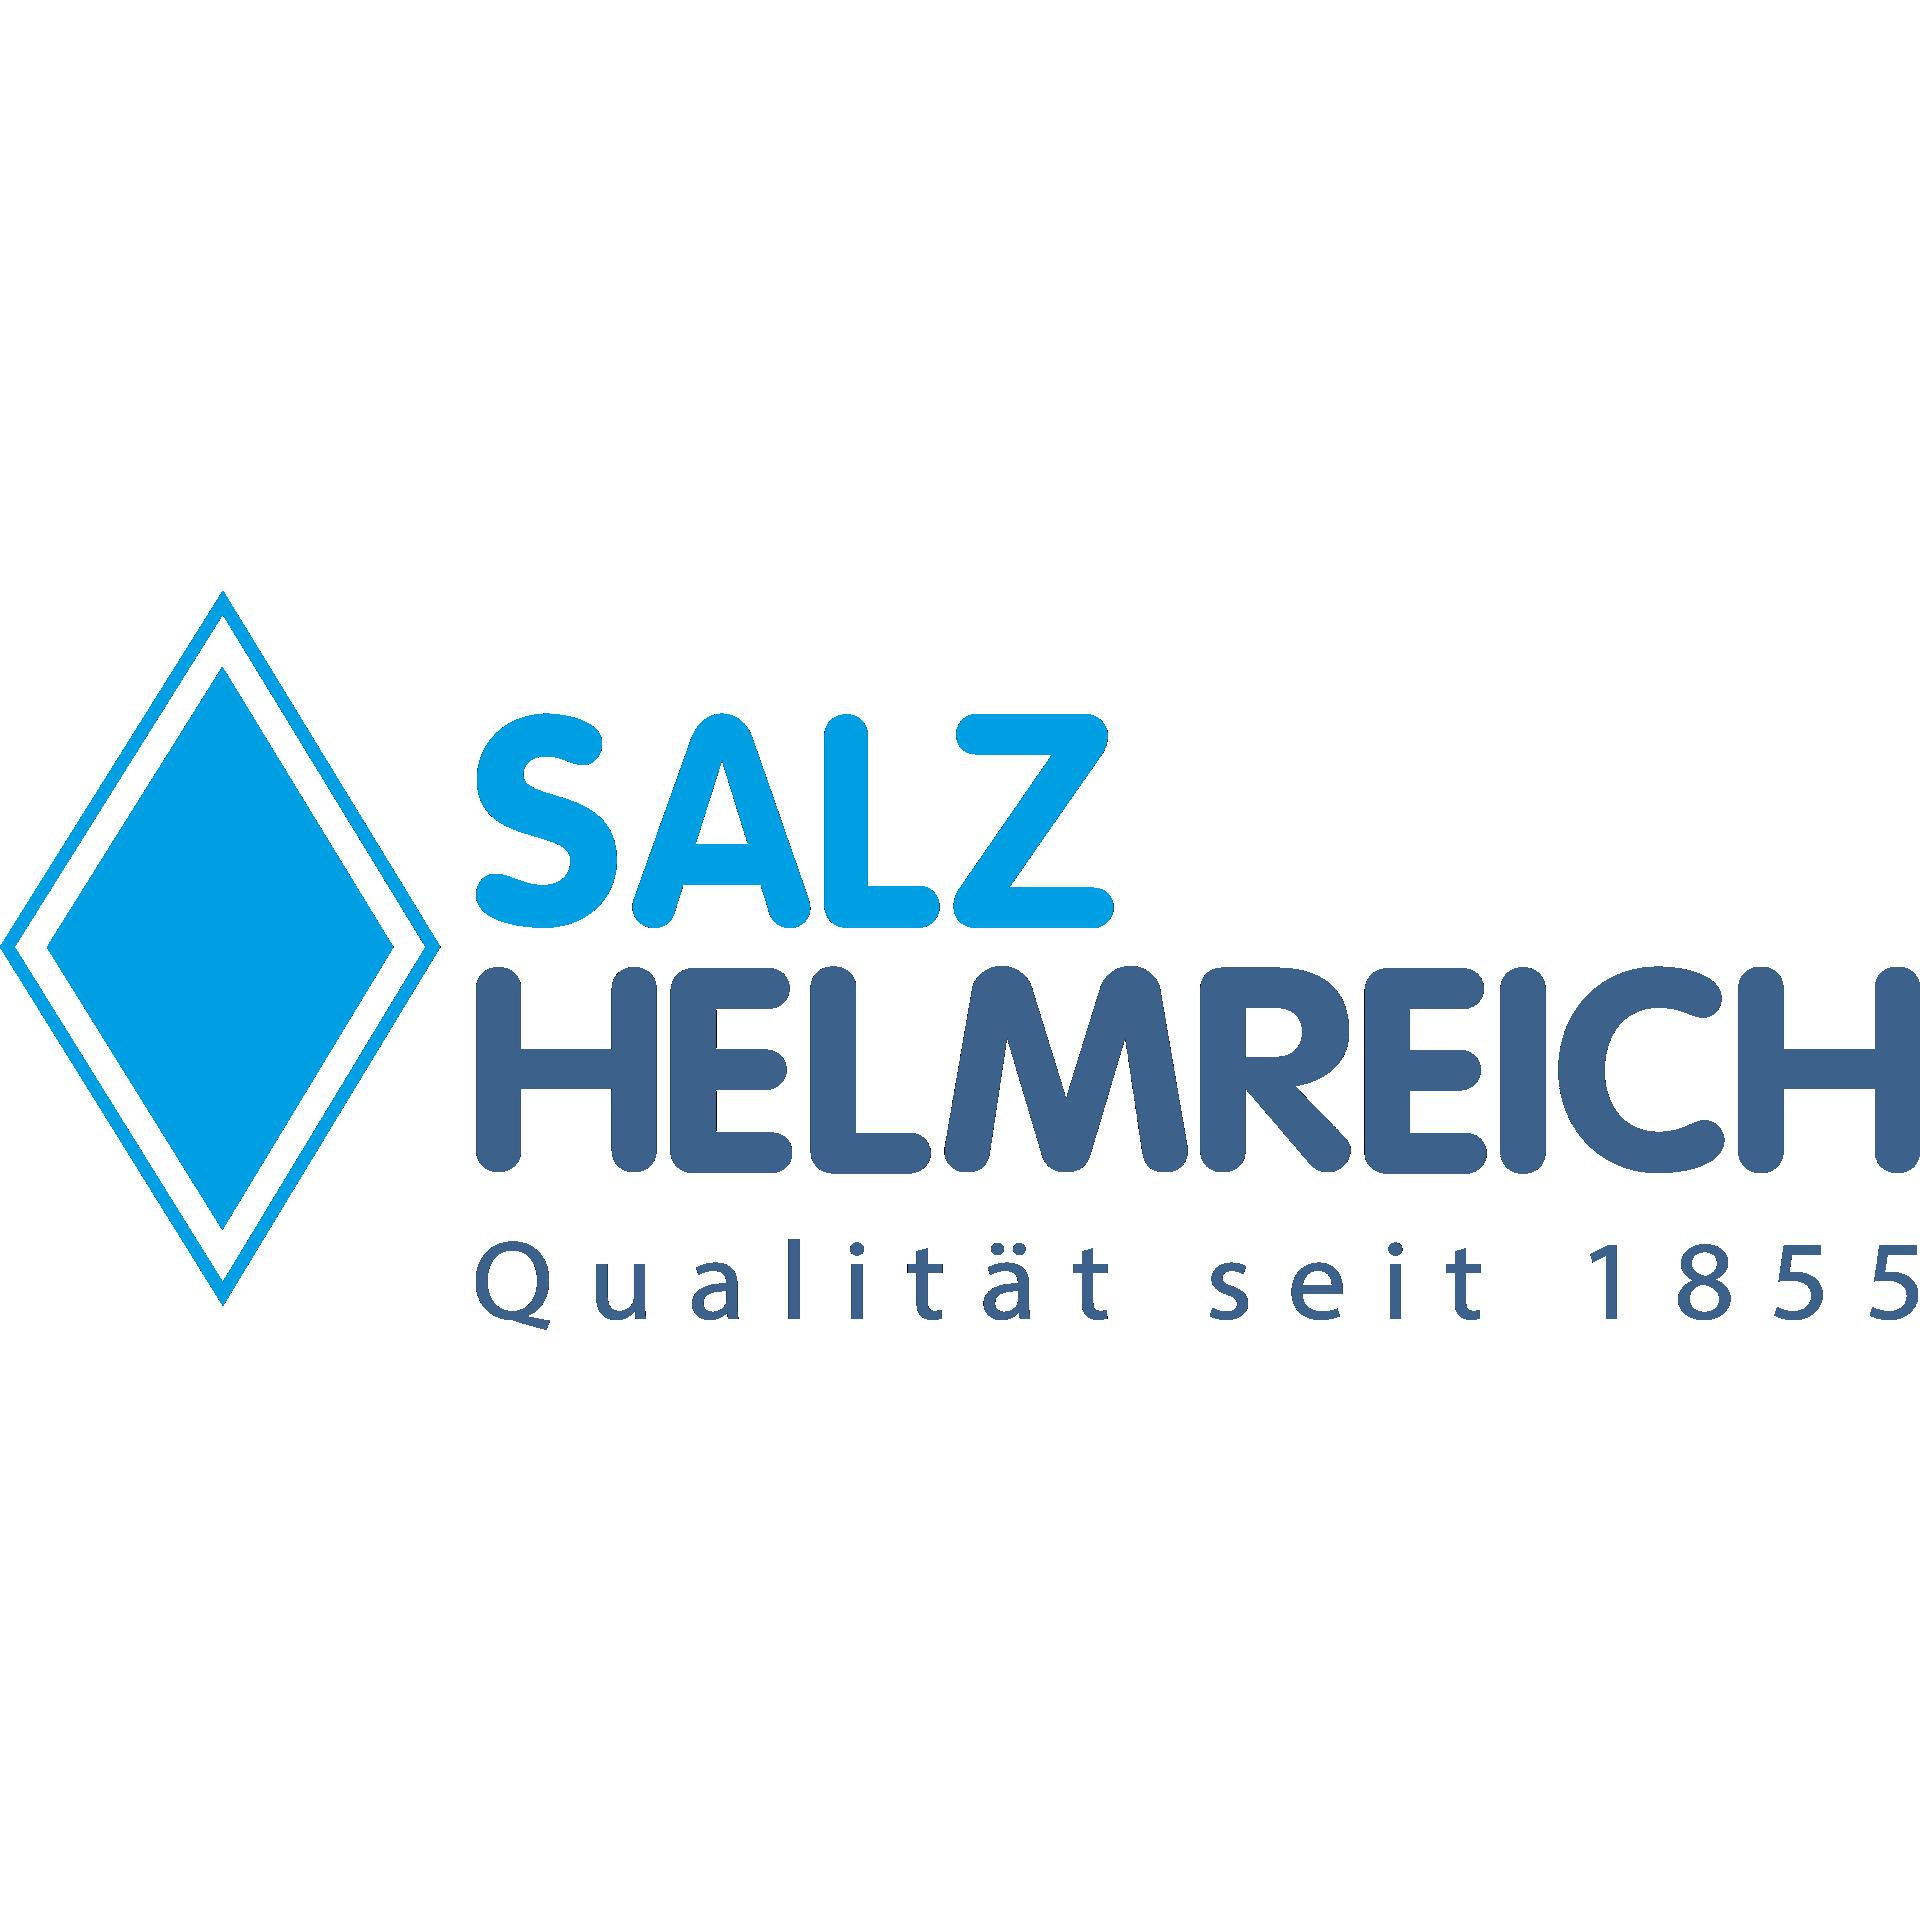 Calciumchlorid Schuppen 77% Dihydrat(2-Hydrat), E 509, im 25kg Sack (Abb. ähnlich)